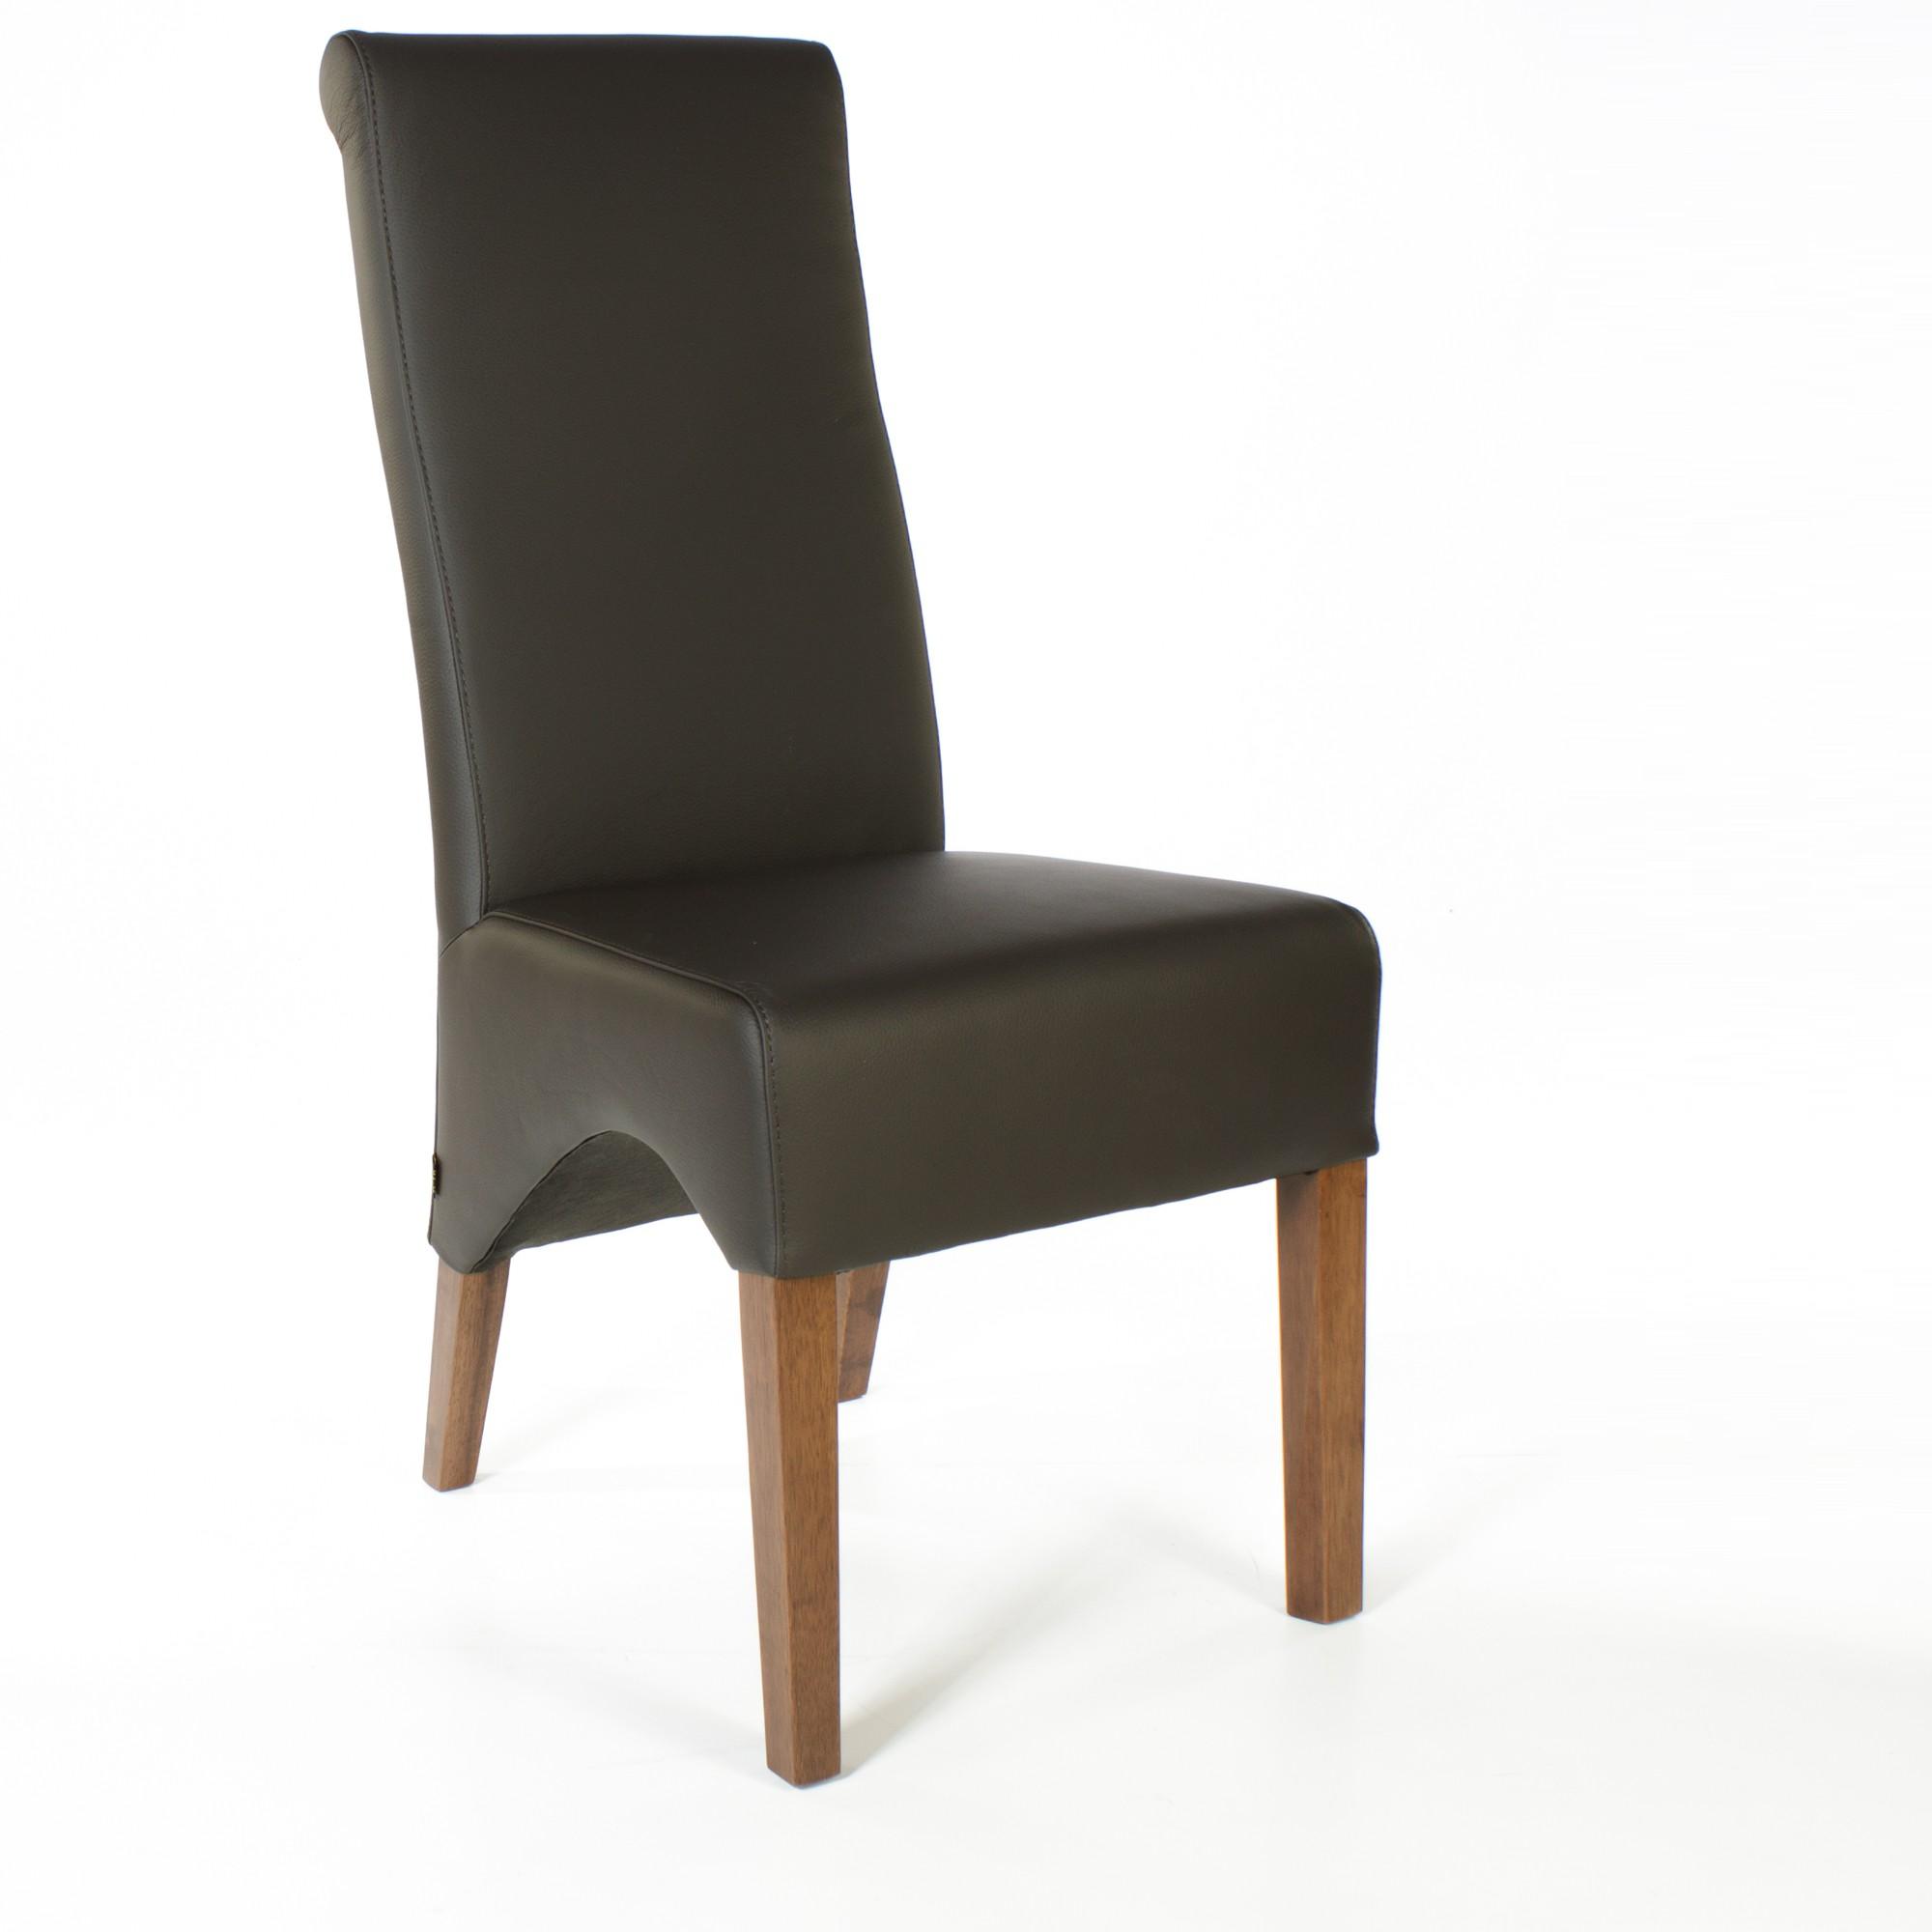 lederstuhl regina federkern dark braun nussbaum. Black Bedroom Furniture Sets. Home Design Ideas